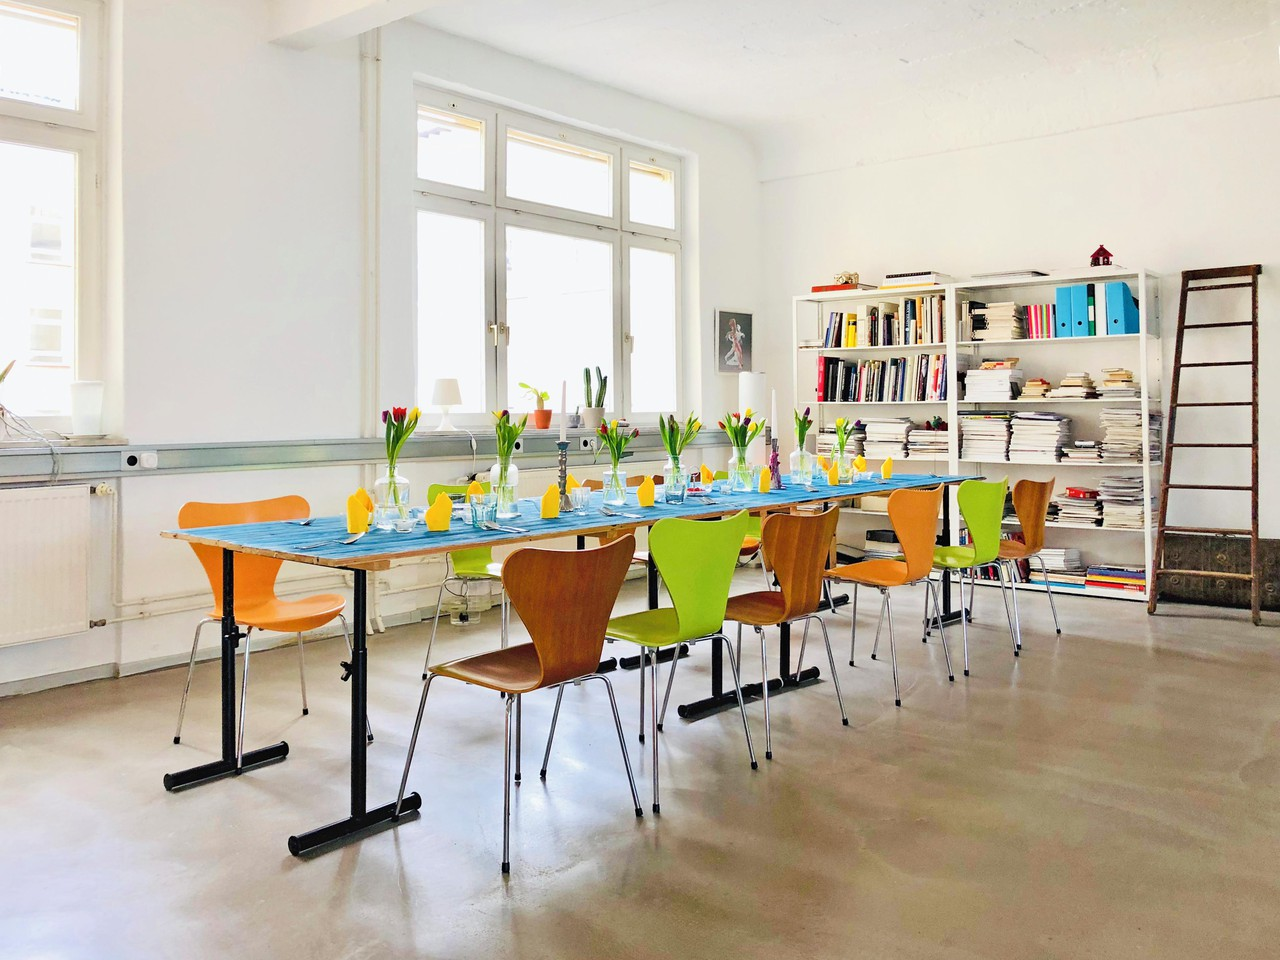 Frankfurt workshop spaces Loft Bright loft in Offenbach city centre image 5